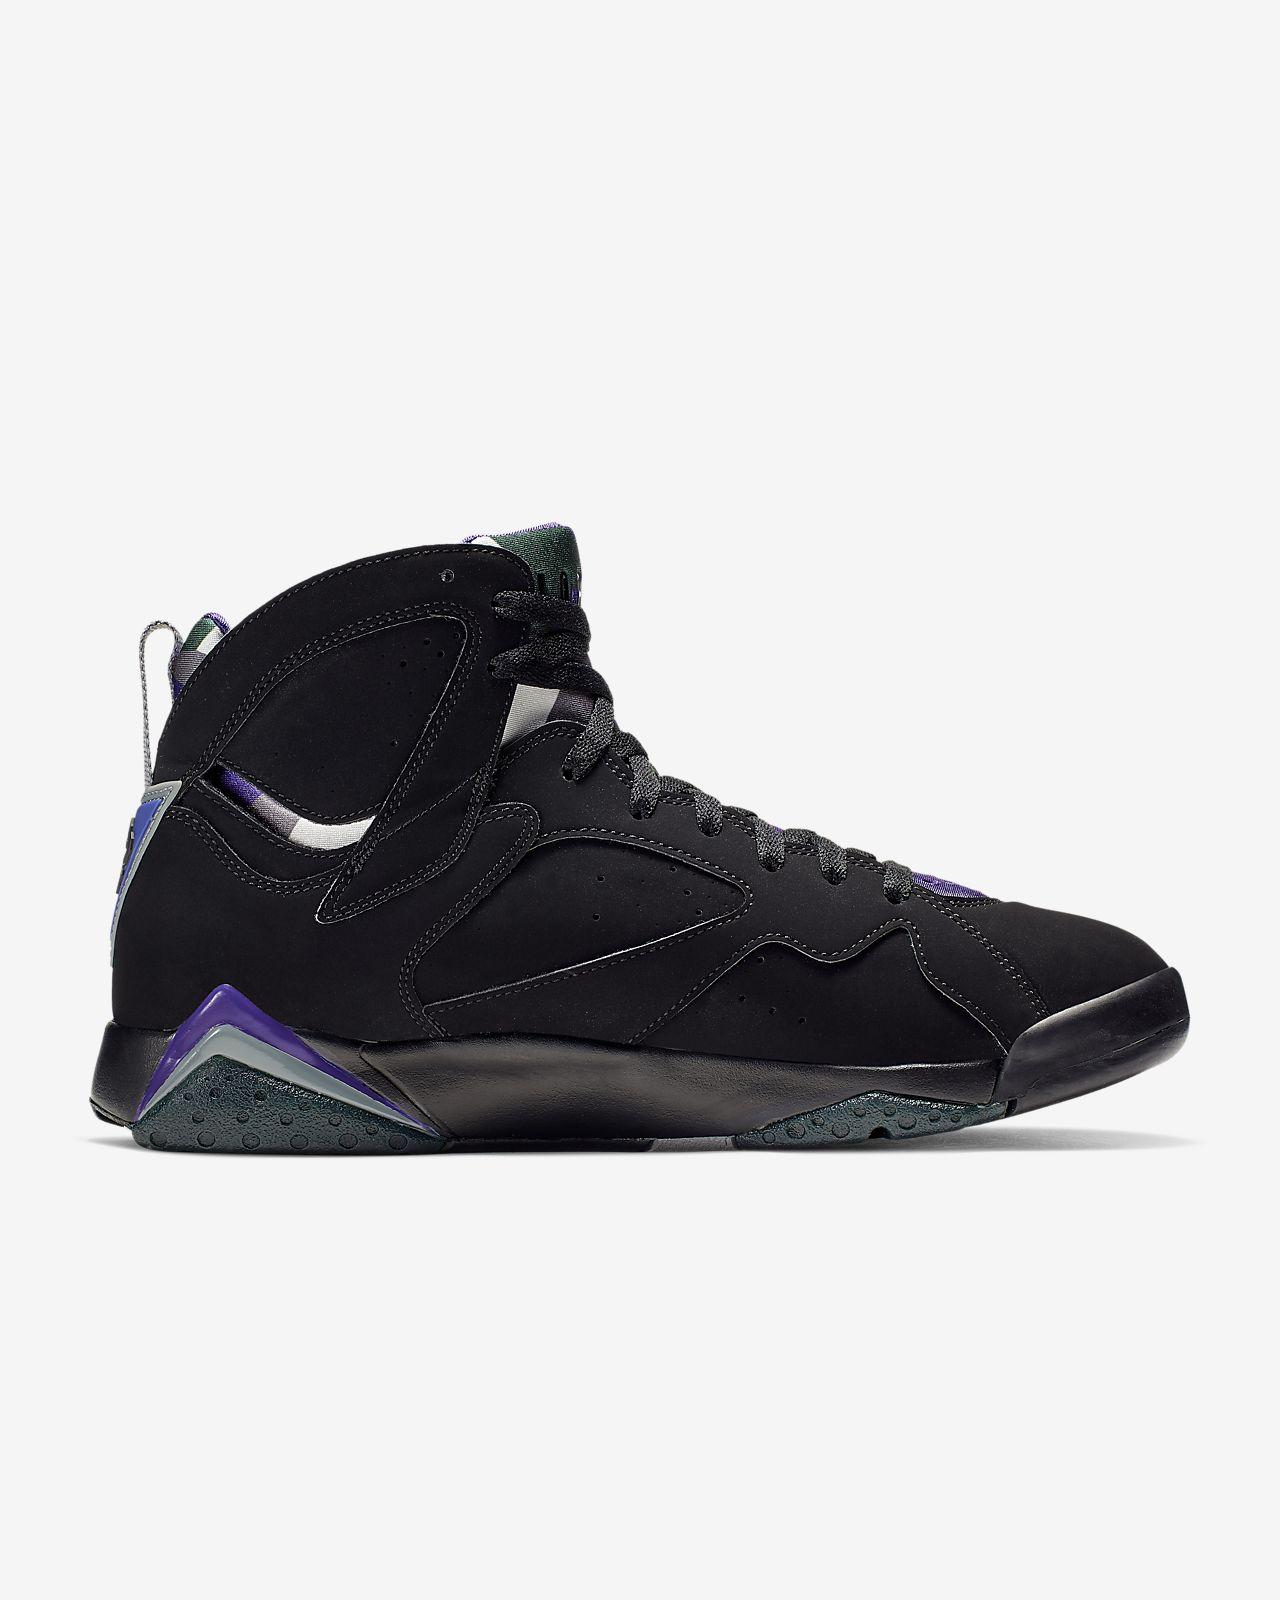 db32e337480 Air Jordan 7 Retro Men's Shoe. Nike.com